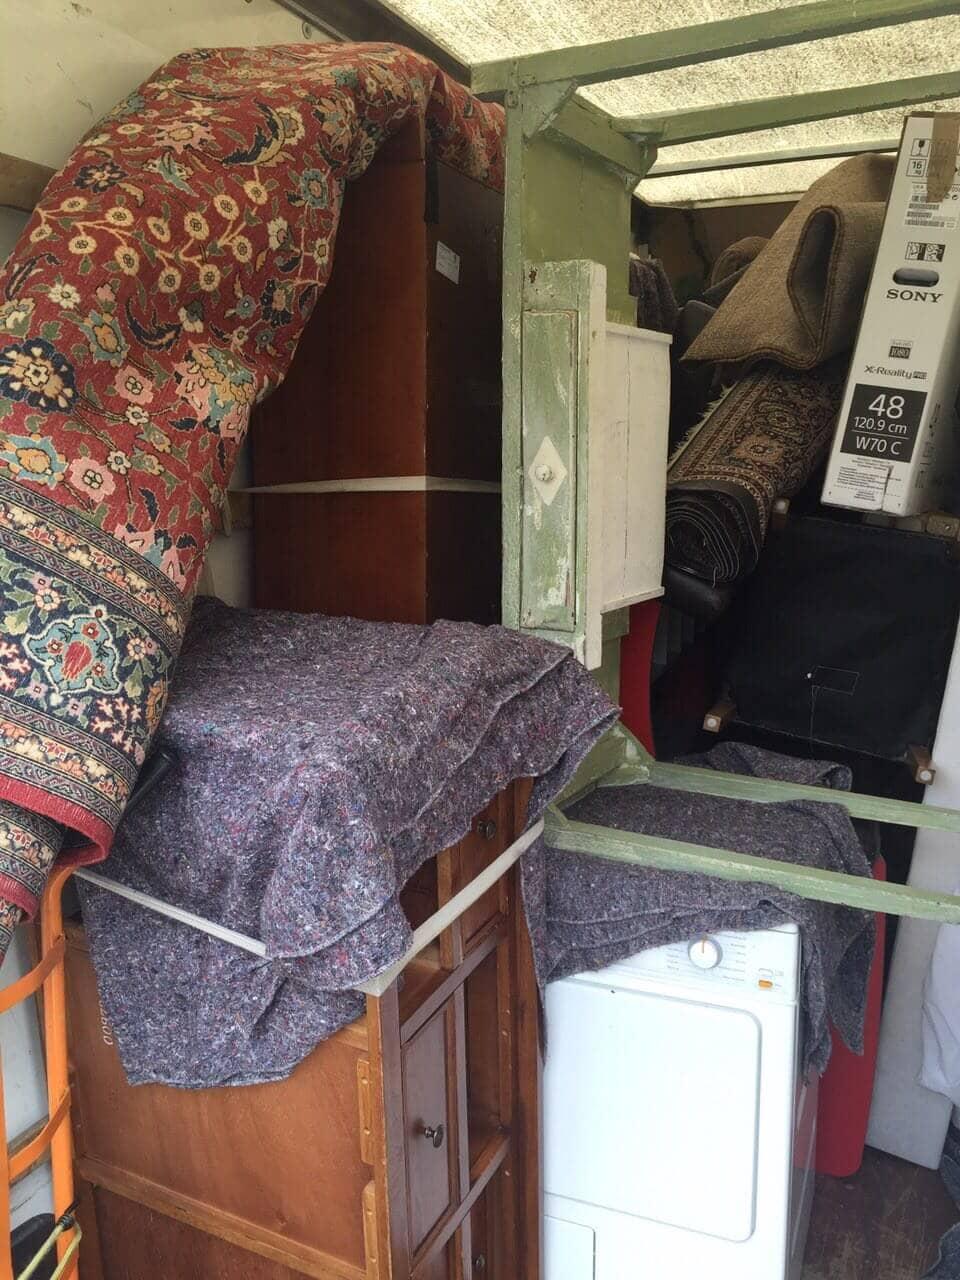 Streatham Hill van with man SW2